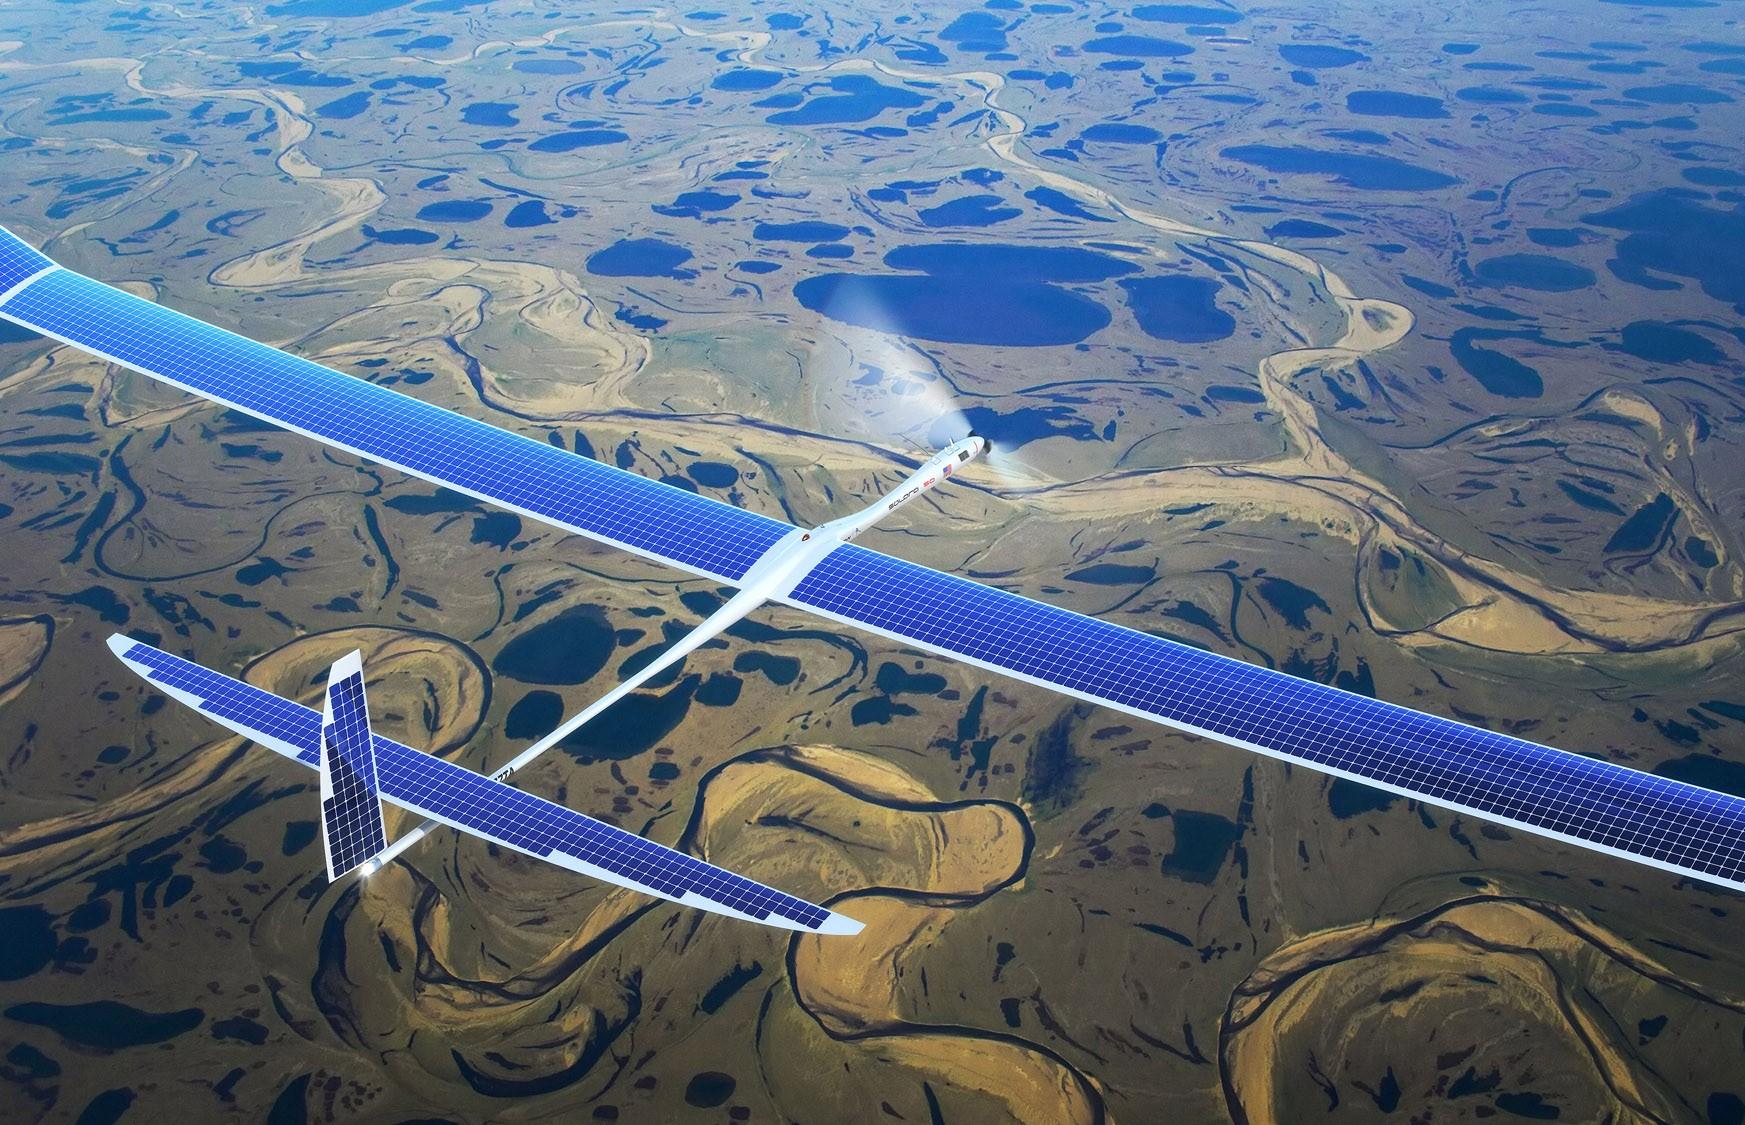 Google usa drones solares para disseminar internet 40x mais rápida